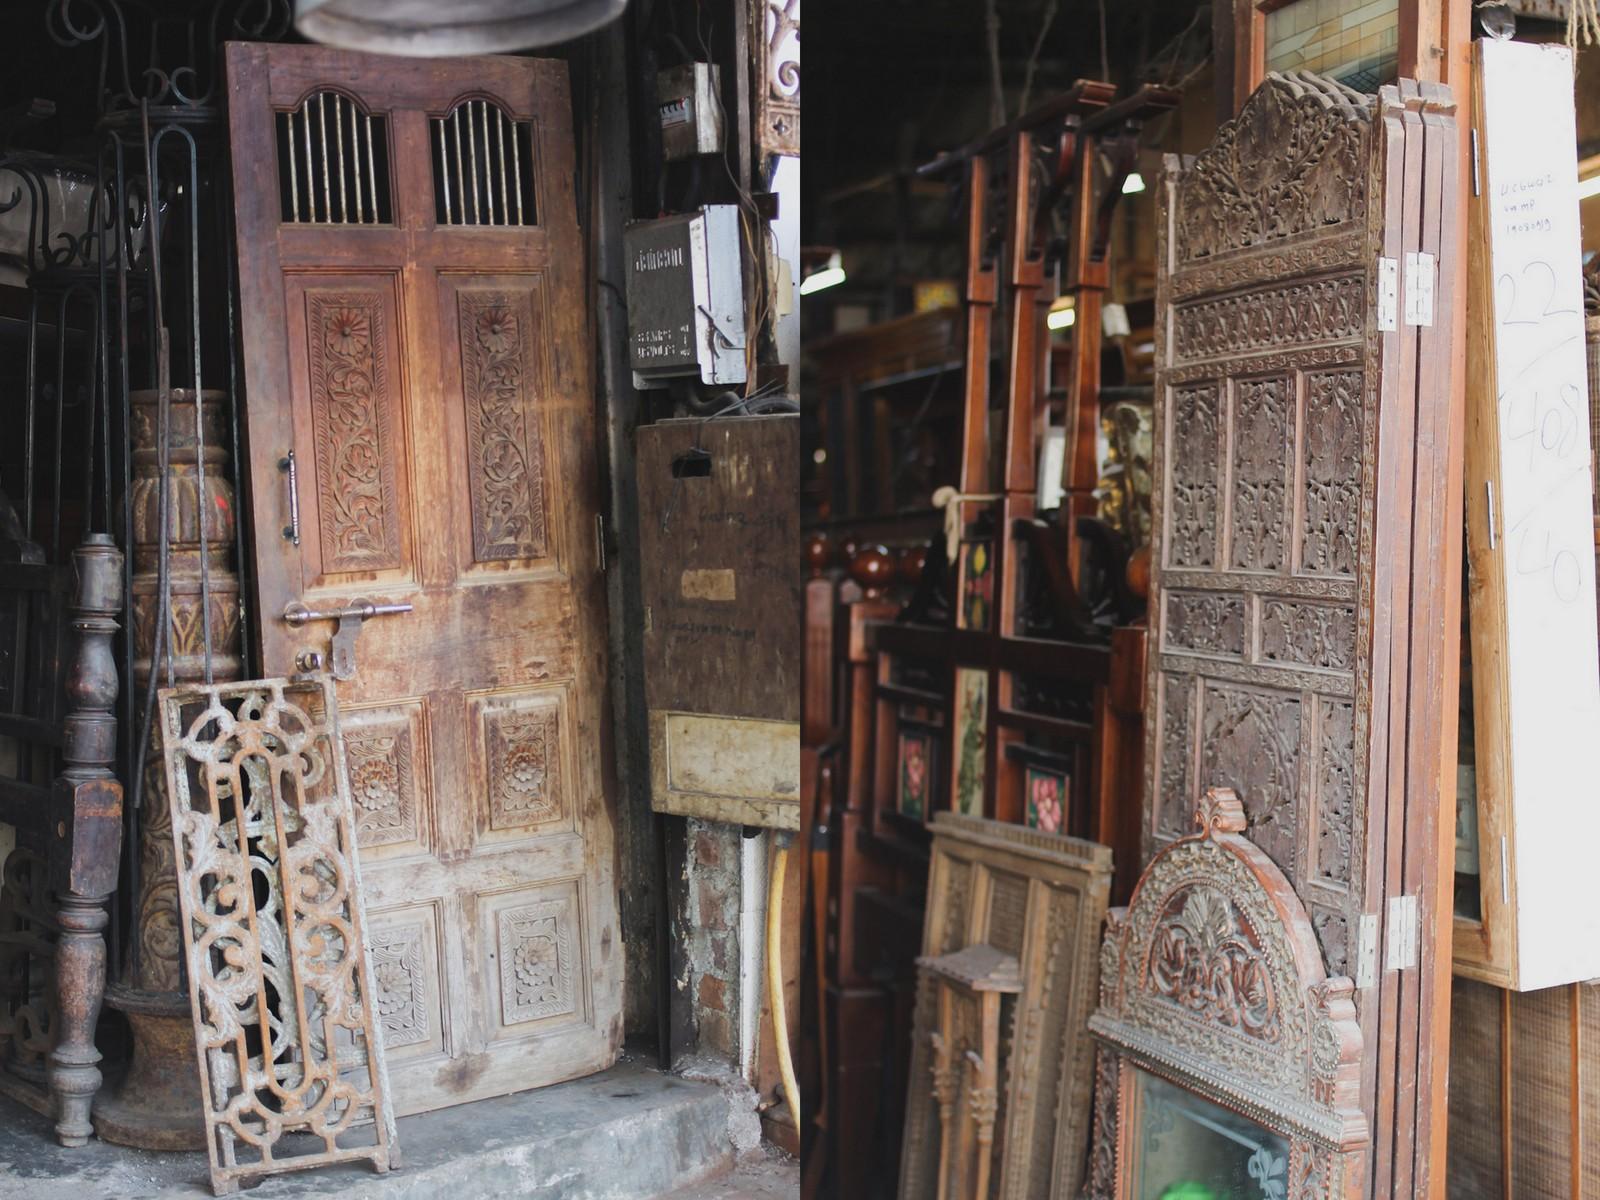 Oshiwara Antique Market In Jogeshwari